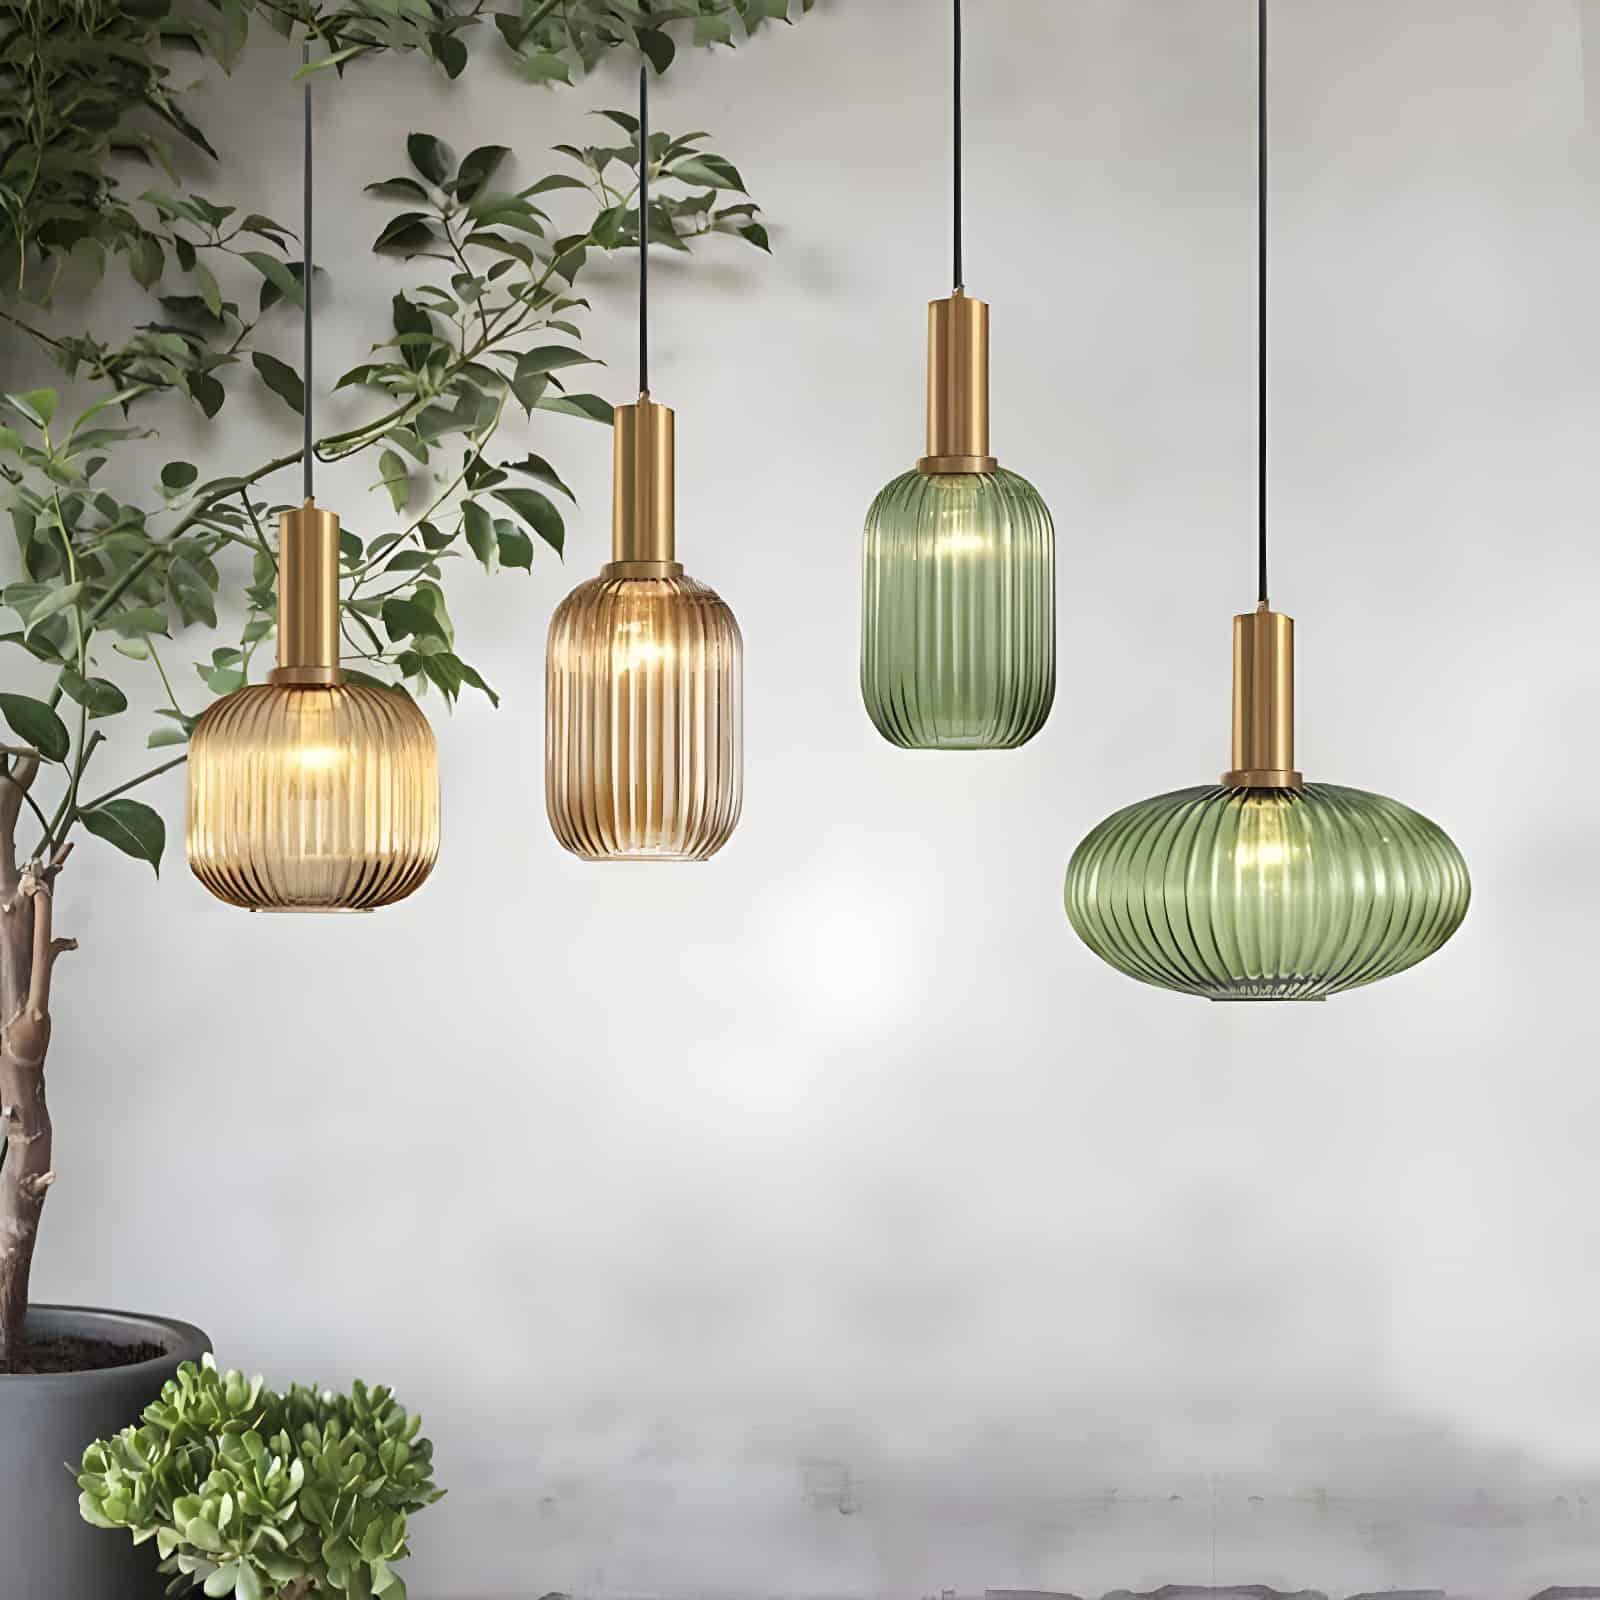 Bohemian Phoenix Pendant Lighting unique and elegant Pendant lighting